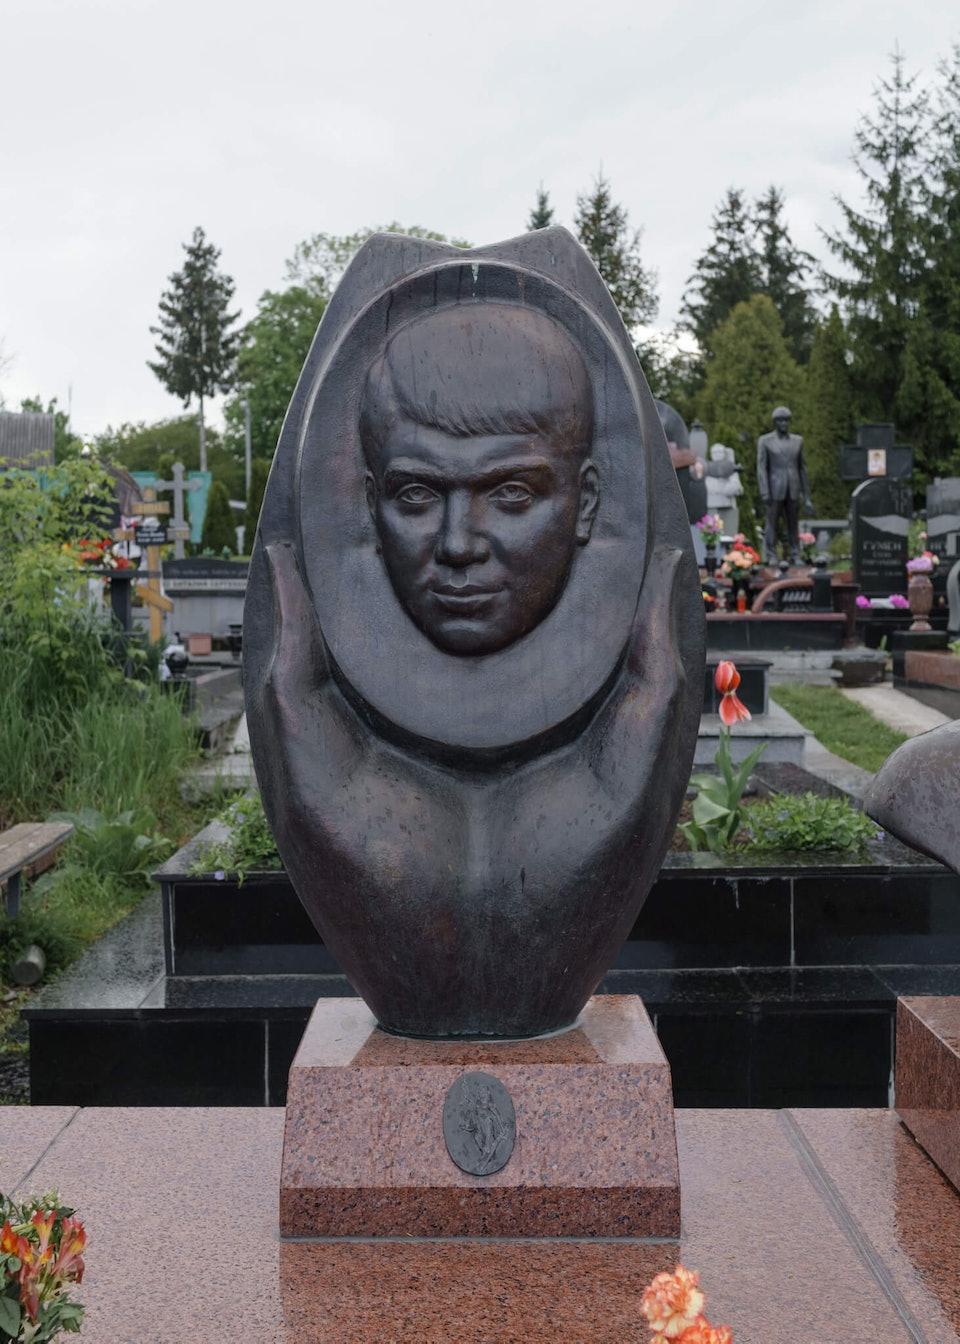 BIF_Graves_Sovky_12 Кладбища Пруткин_prutkin